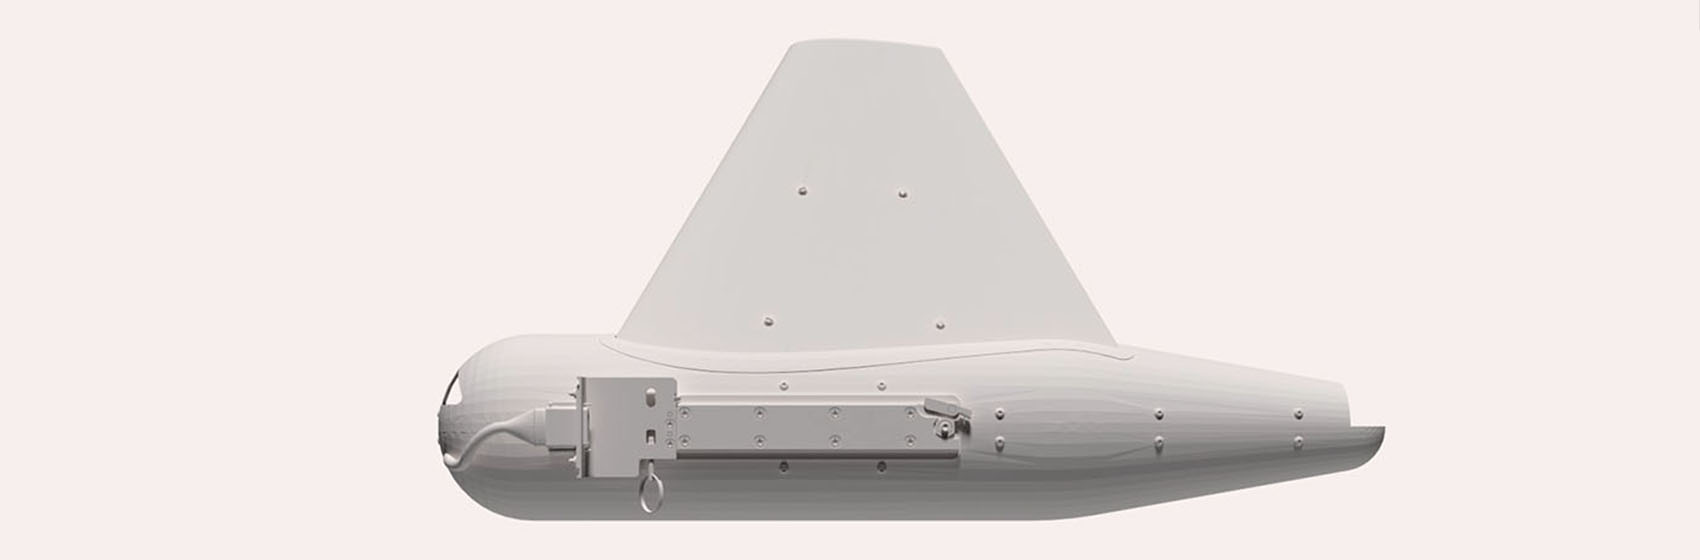 nsp-5-uwbgrey